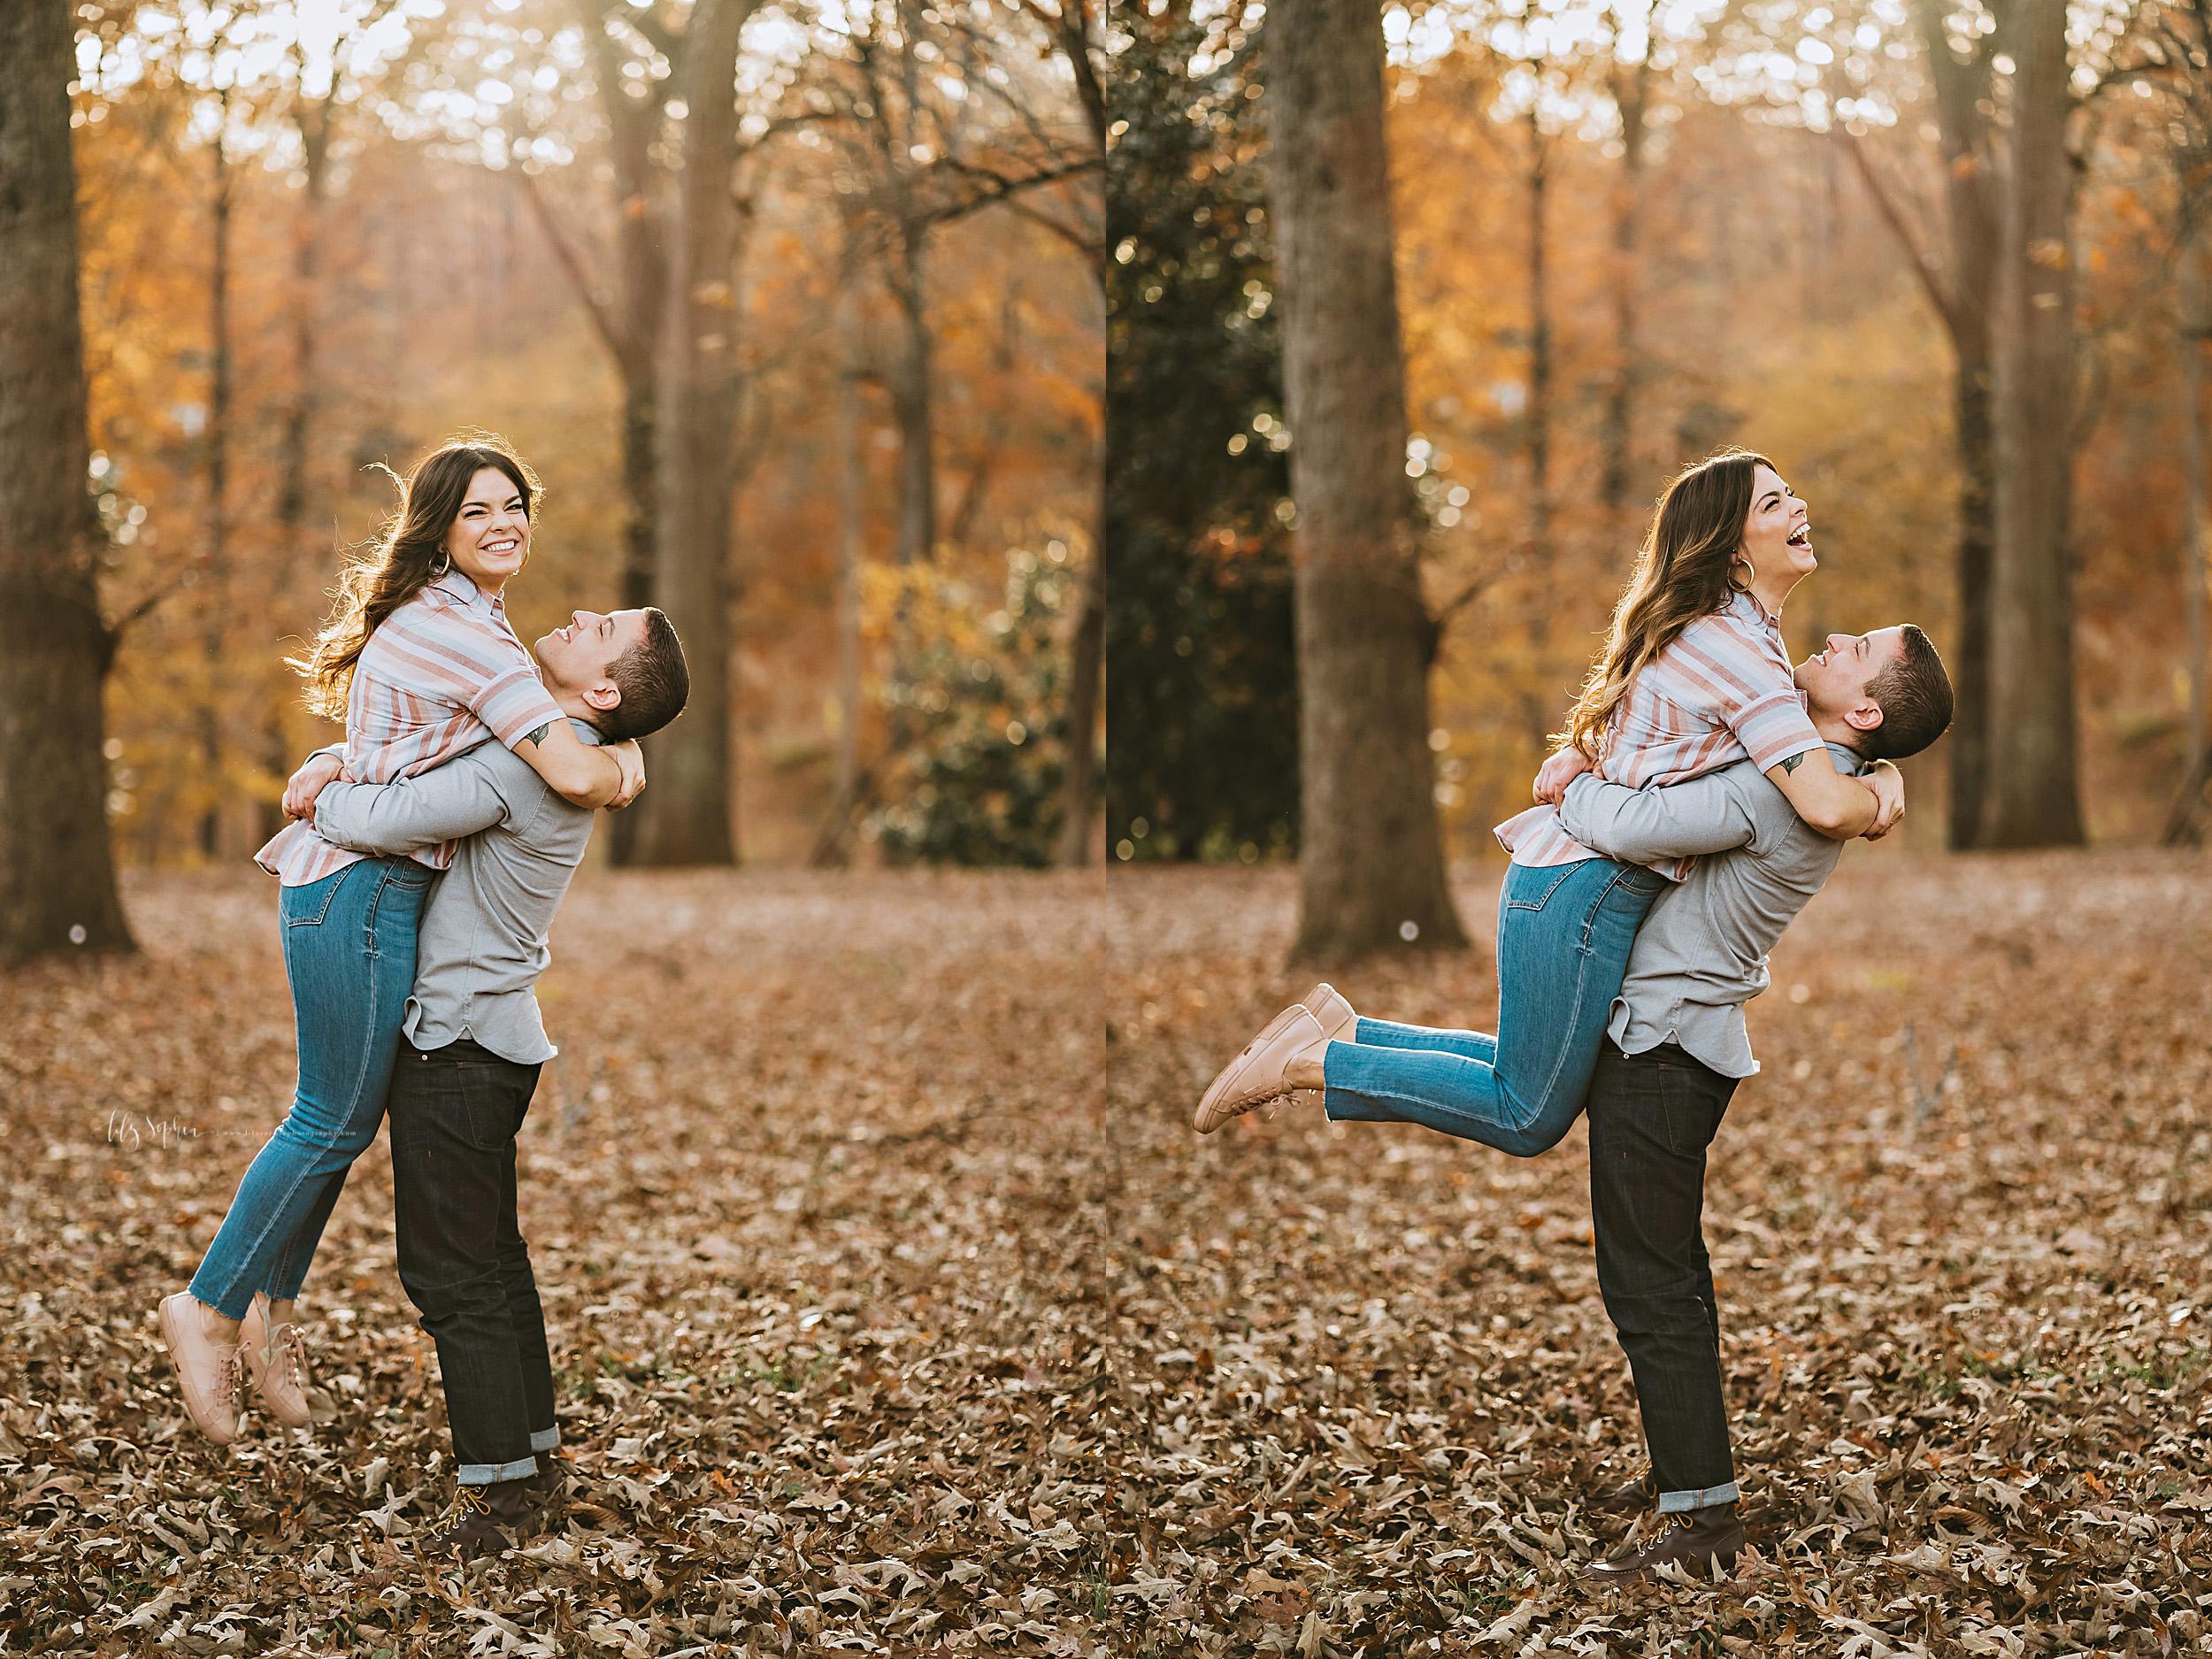 atlanta-reynoldstown-peoplestown-decatur-sandy-springs-buckhead-virginia-highlands-west-end-decatur-lily-sophia-photography-outdoor-fall-couples-photos_1481.jpg